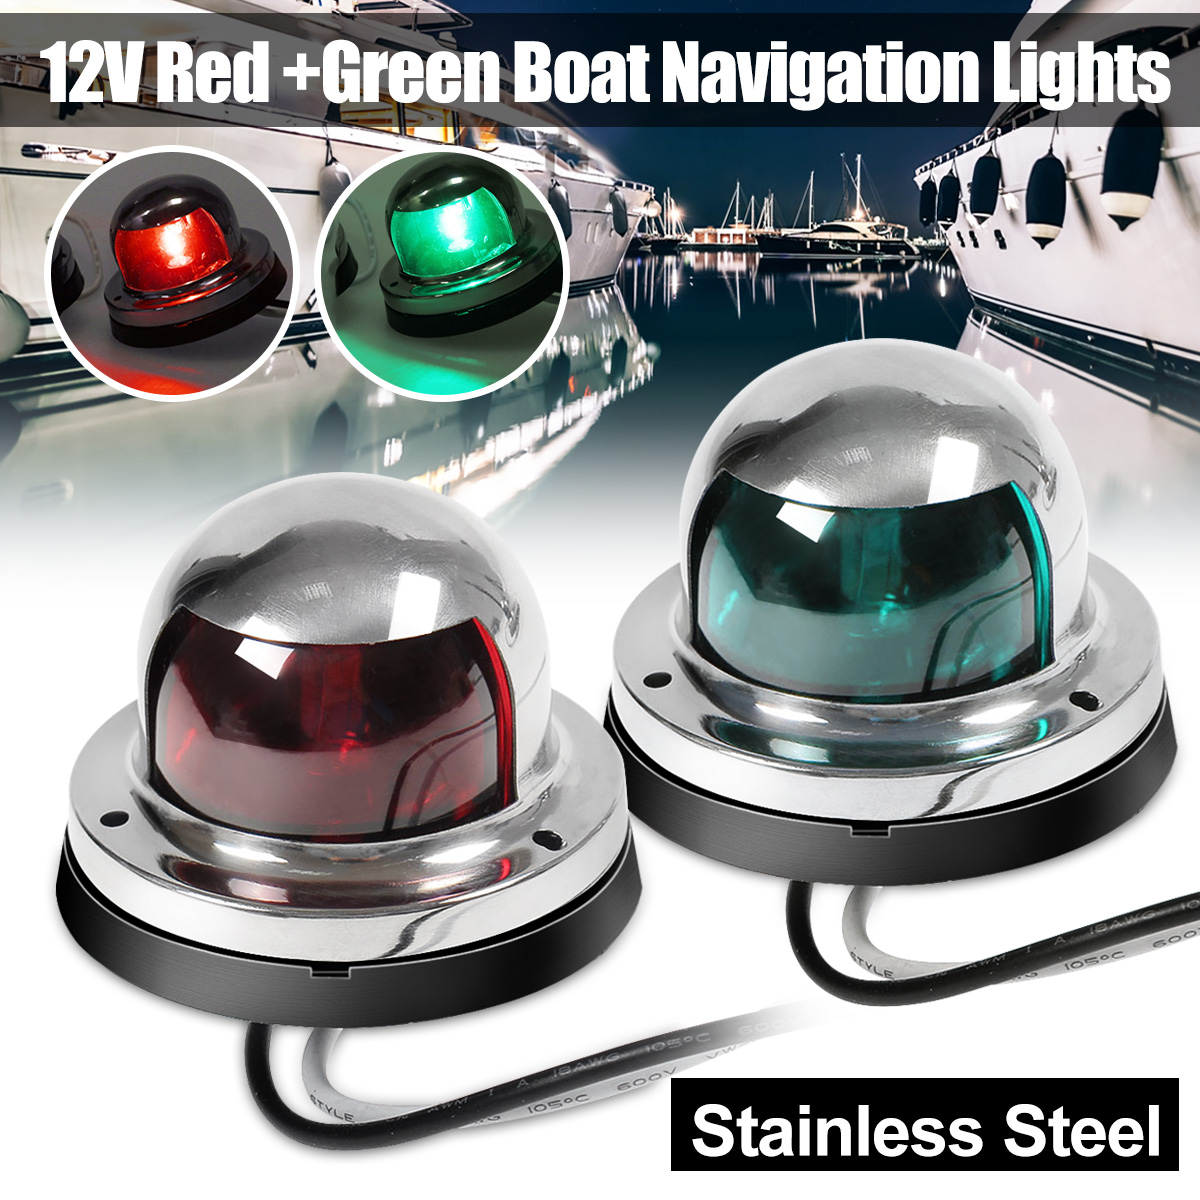 Marine Boat Yacht Pontoon 12V Stainless Steel LED Bow Navigation Light Green ha